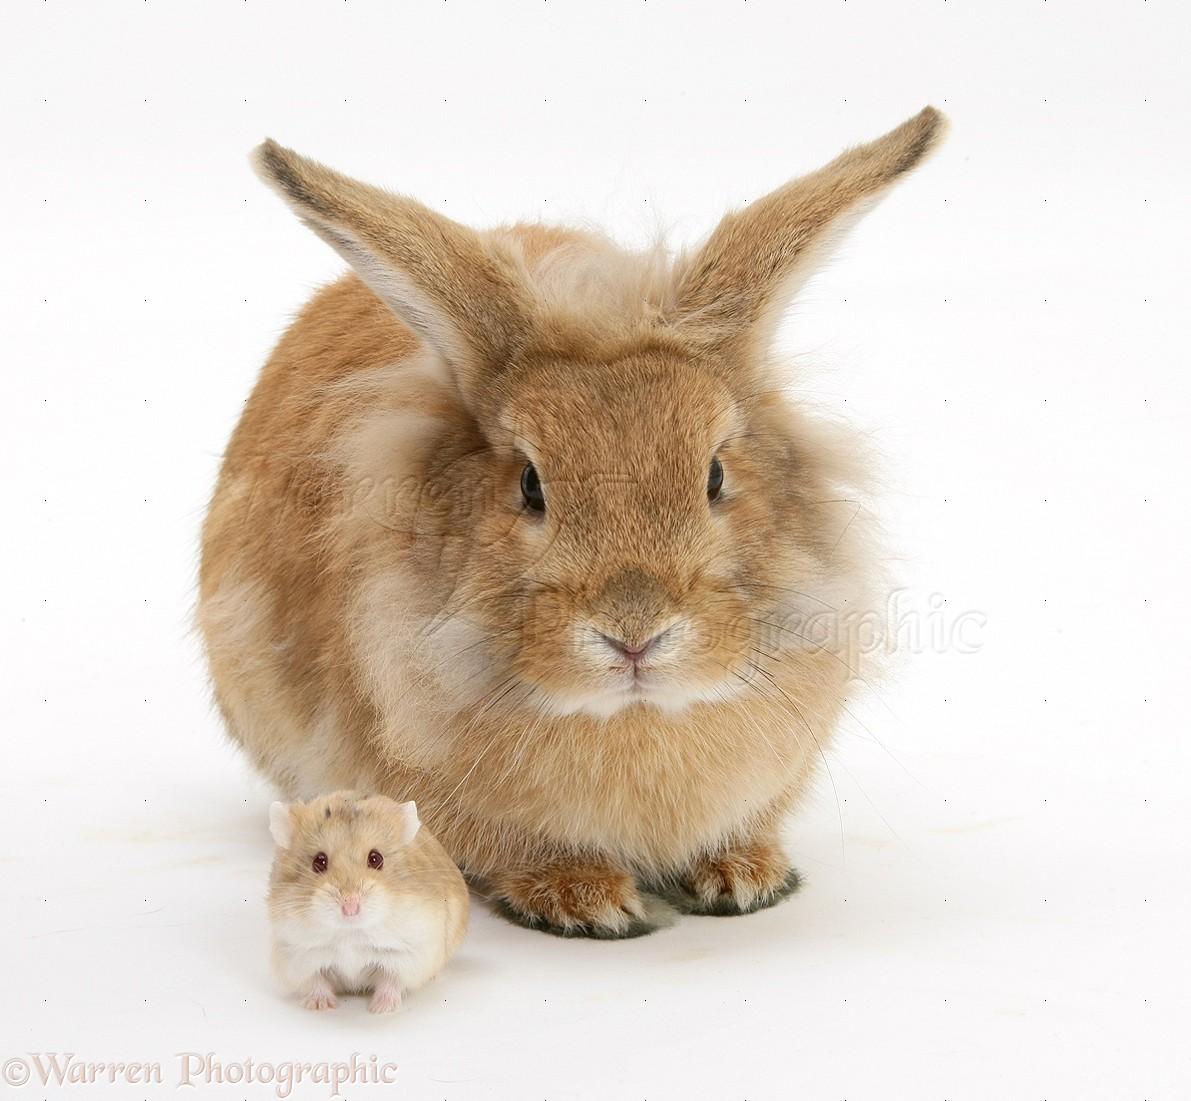 WP25627 Sandy Lionhead rabbit meeting Dwarf Siberian Hamster.